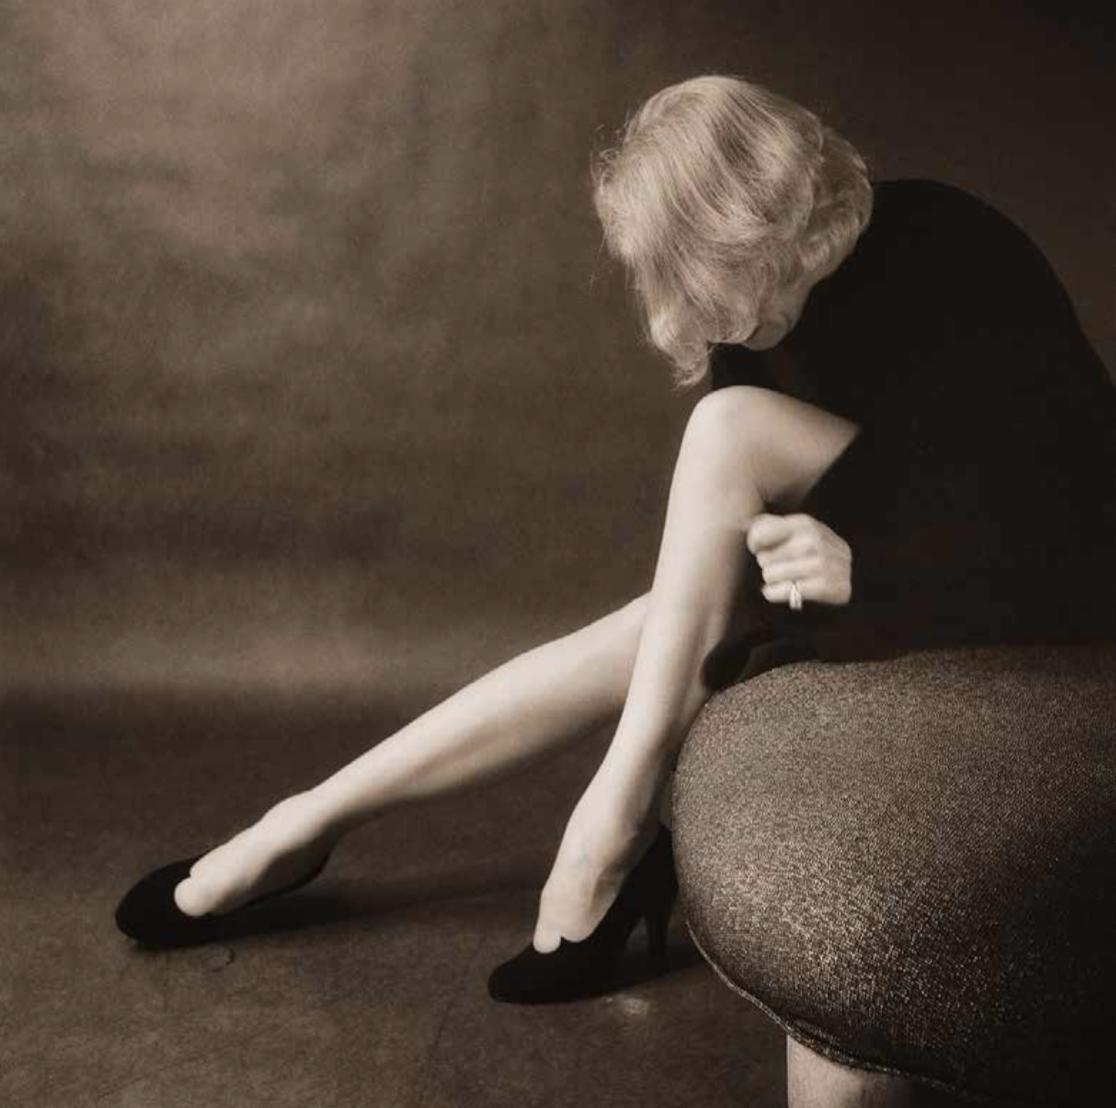 MARLENE DIETRICH, NEW YORK 1952 (©MILTON H. GREENE, COURTESY GALERIE DE L'INSTANT, PARIS)